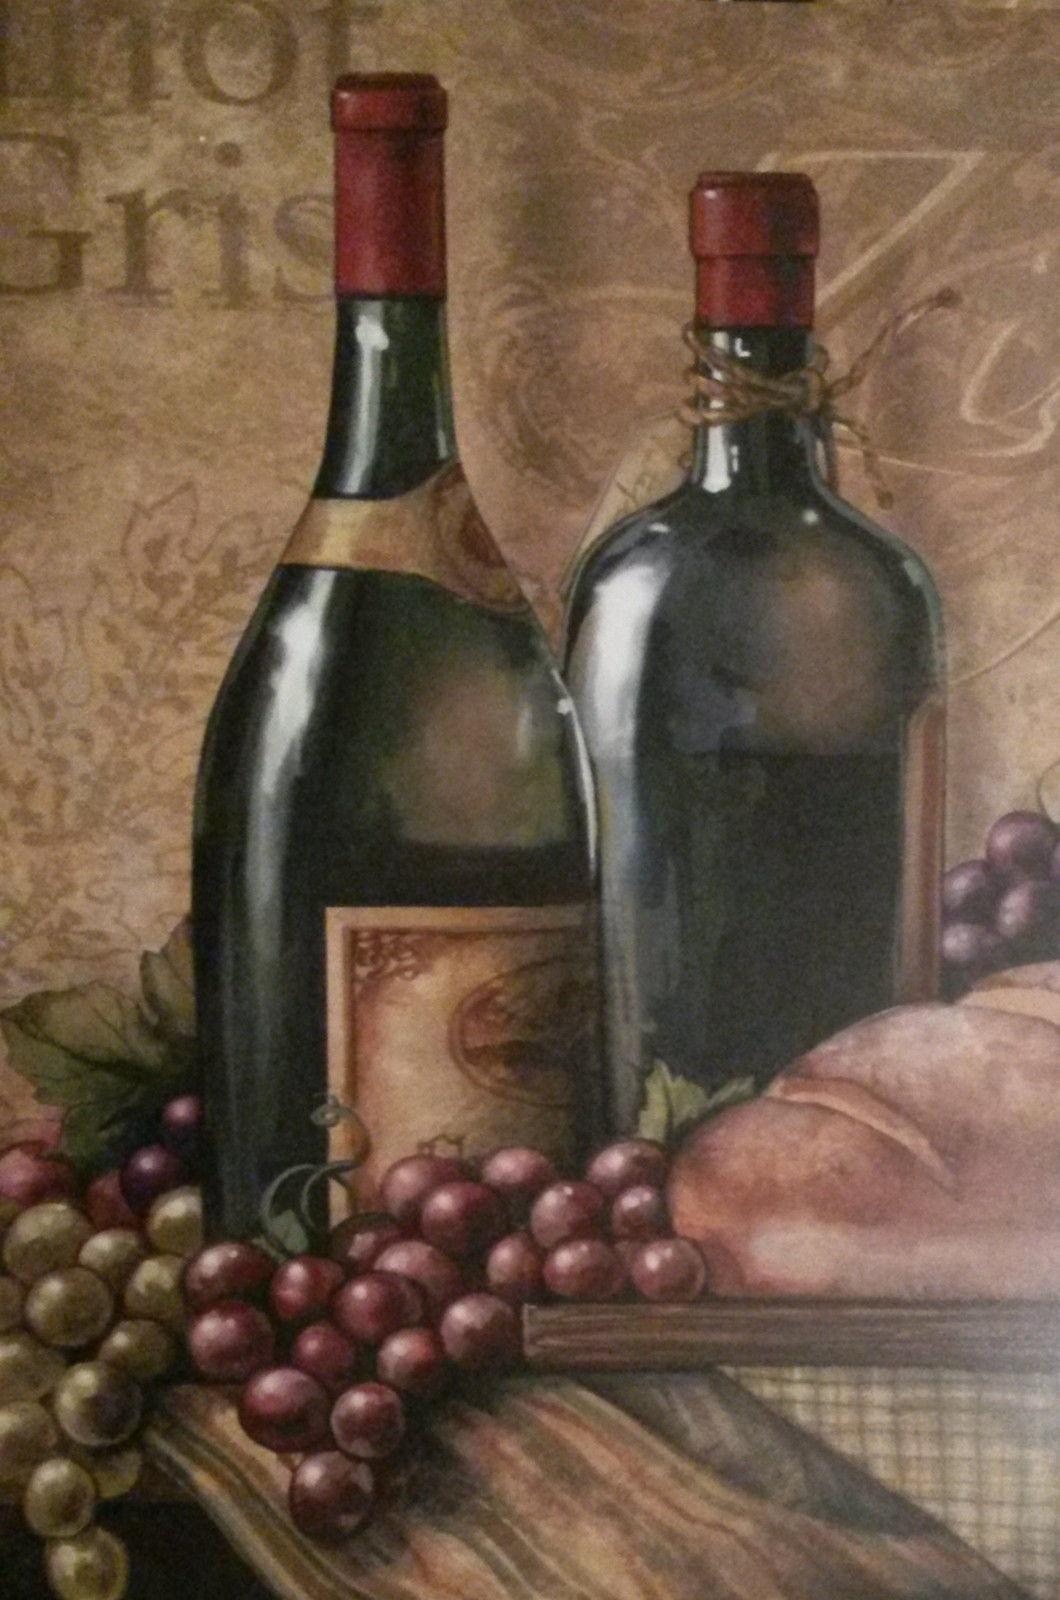 Wine Placemat 4-pc Set Zinfandel Pinot Gris grapes wine glass Plastic NEW